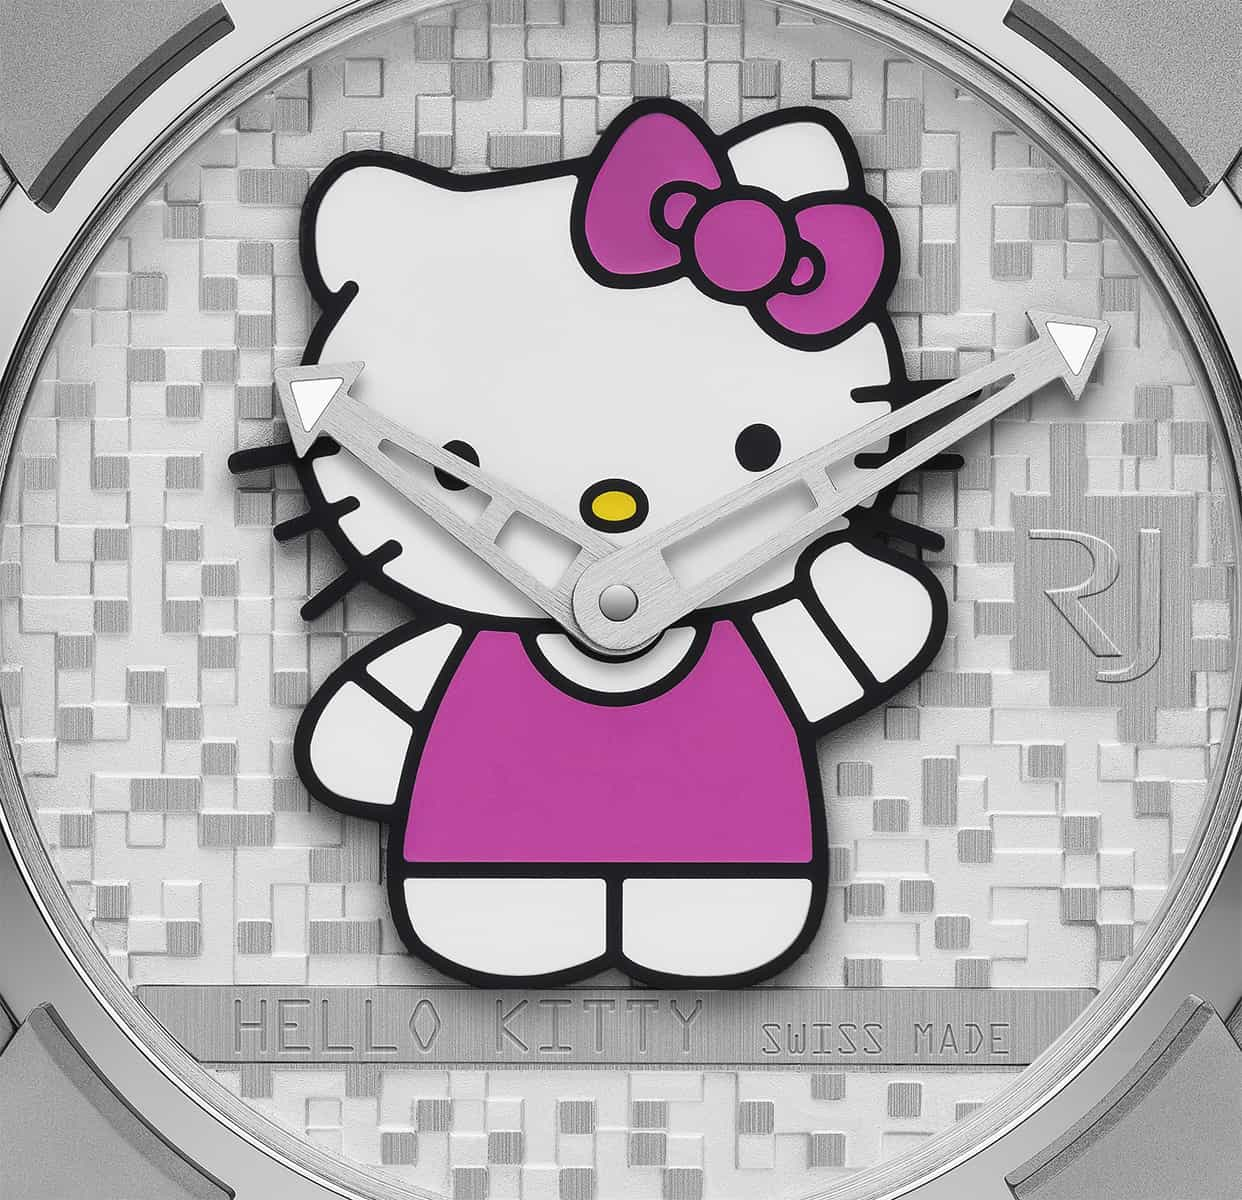 Romain Jerome RJ X Hello Kitty